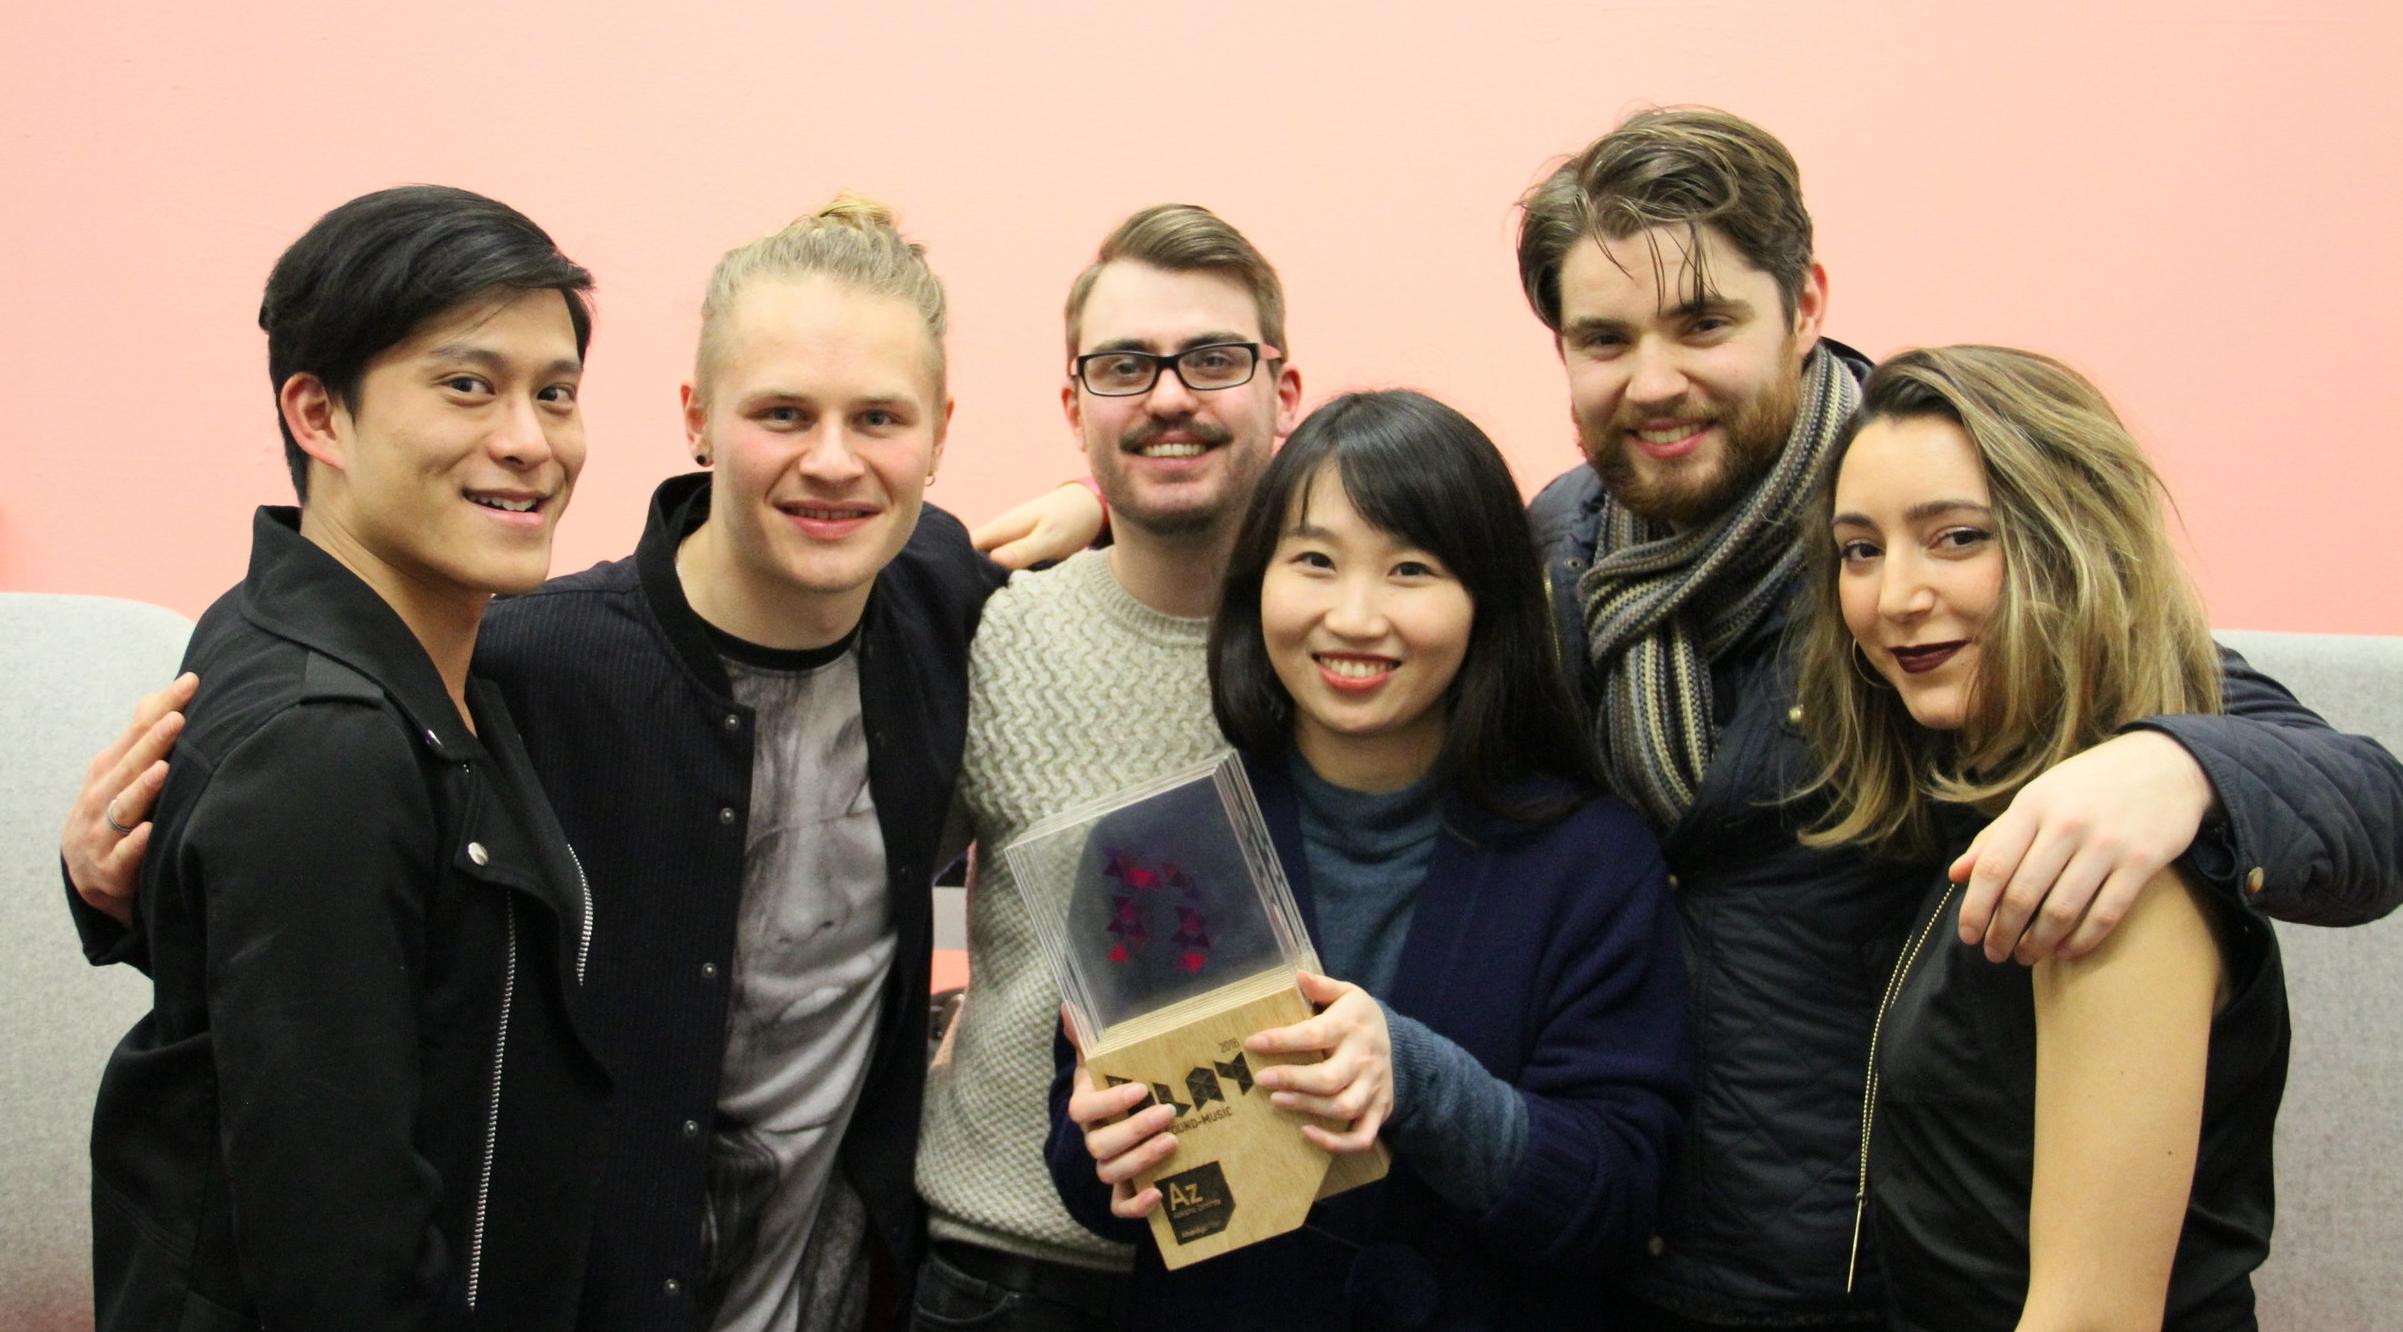 THE TEAM (from left)  Semone Bunnag (Director), Oliver Wegmuller (Sound Designer), Tom Battey (Narrative Designer), Qiao Yu (Artist), Ed Perryer (Animator), Belmin Pilevneli (Artist)